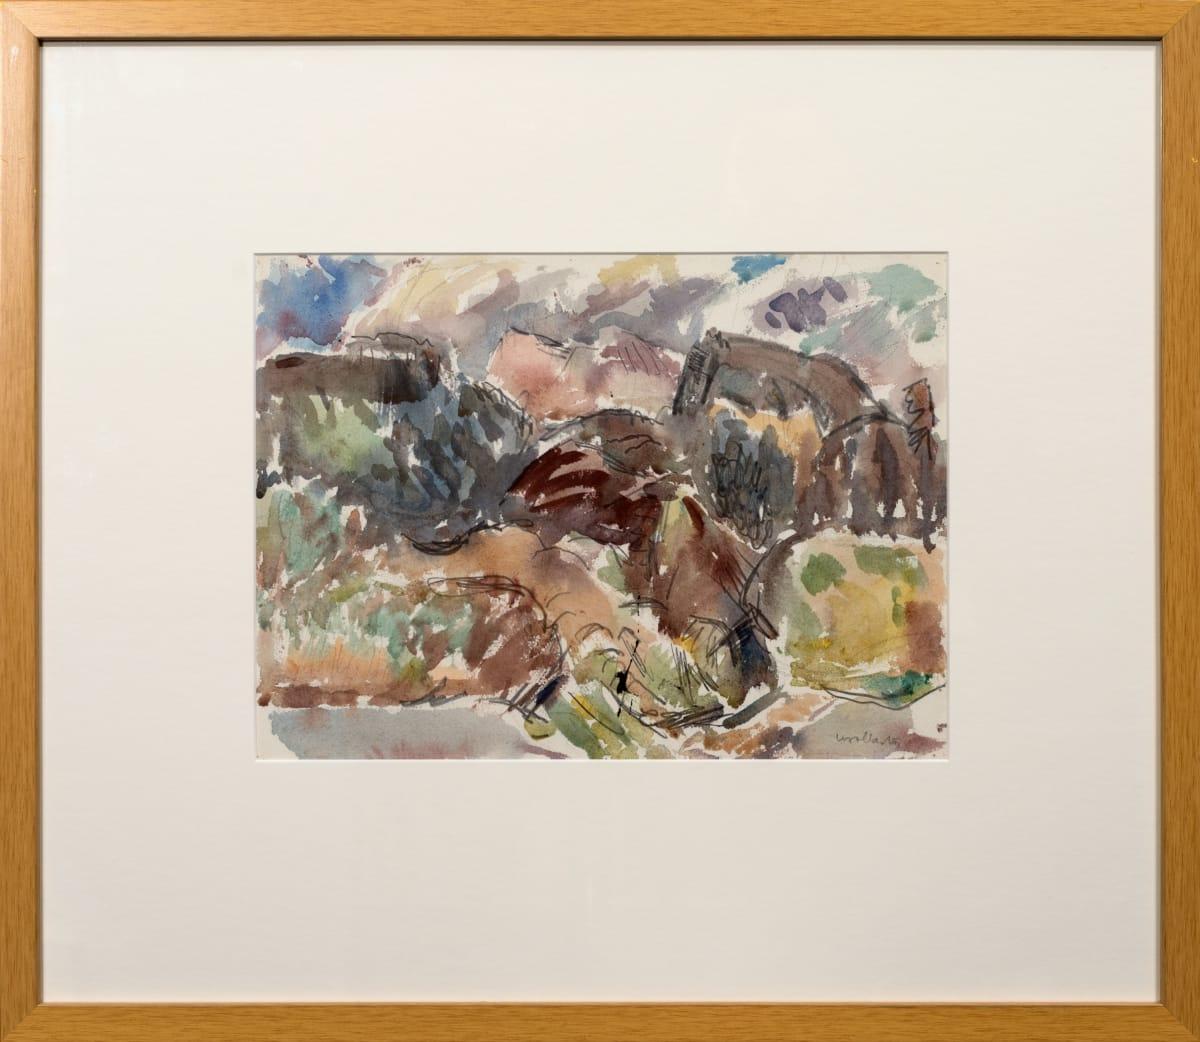 Mountford Tosswill Woollaston, Untitled [Landscape] (3), n.d.